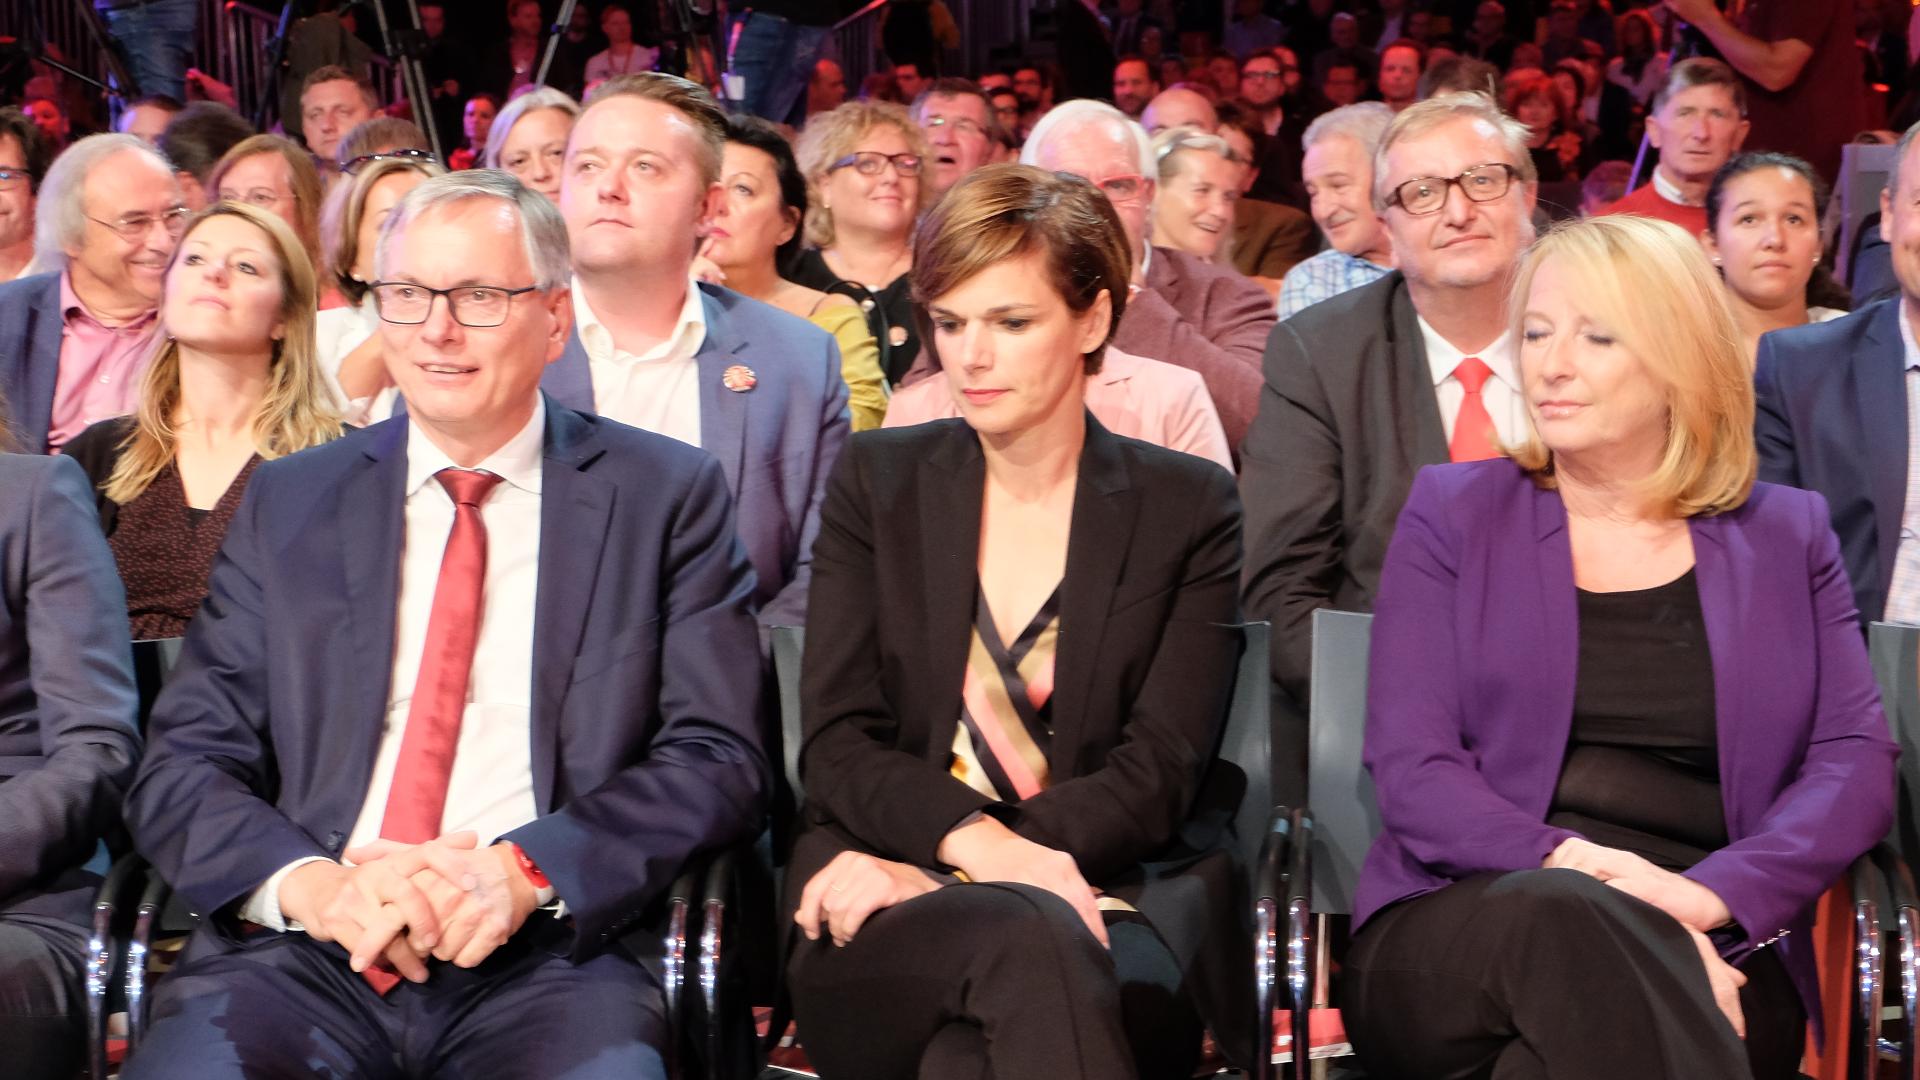 Kern-Pamela-Rendi-Wagner-Doris-Bures-Alois-Stöger